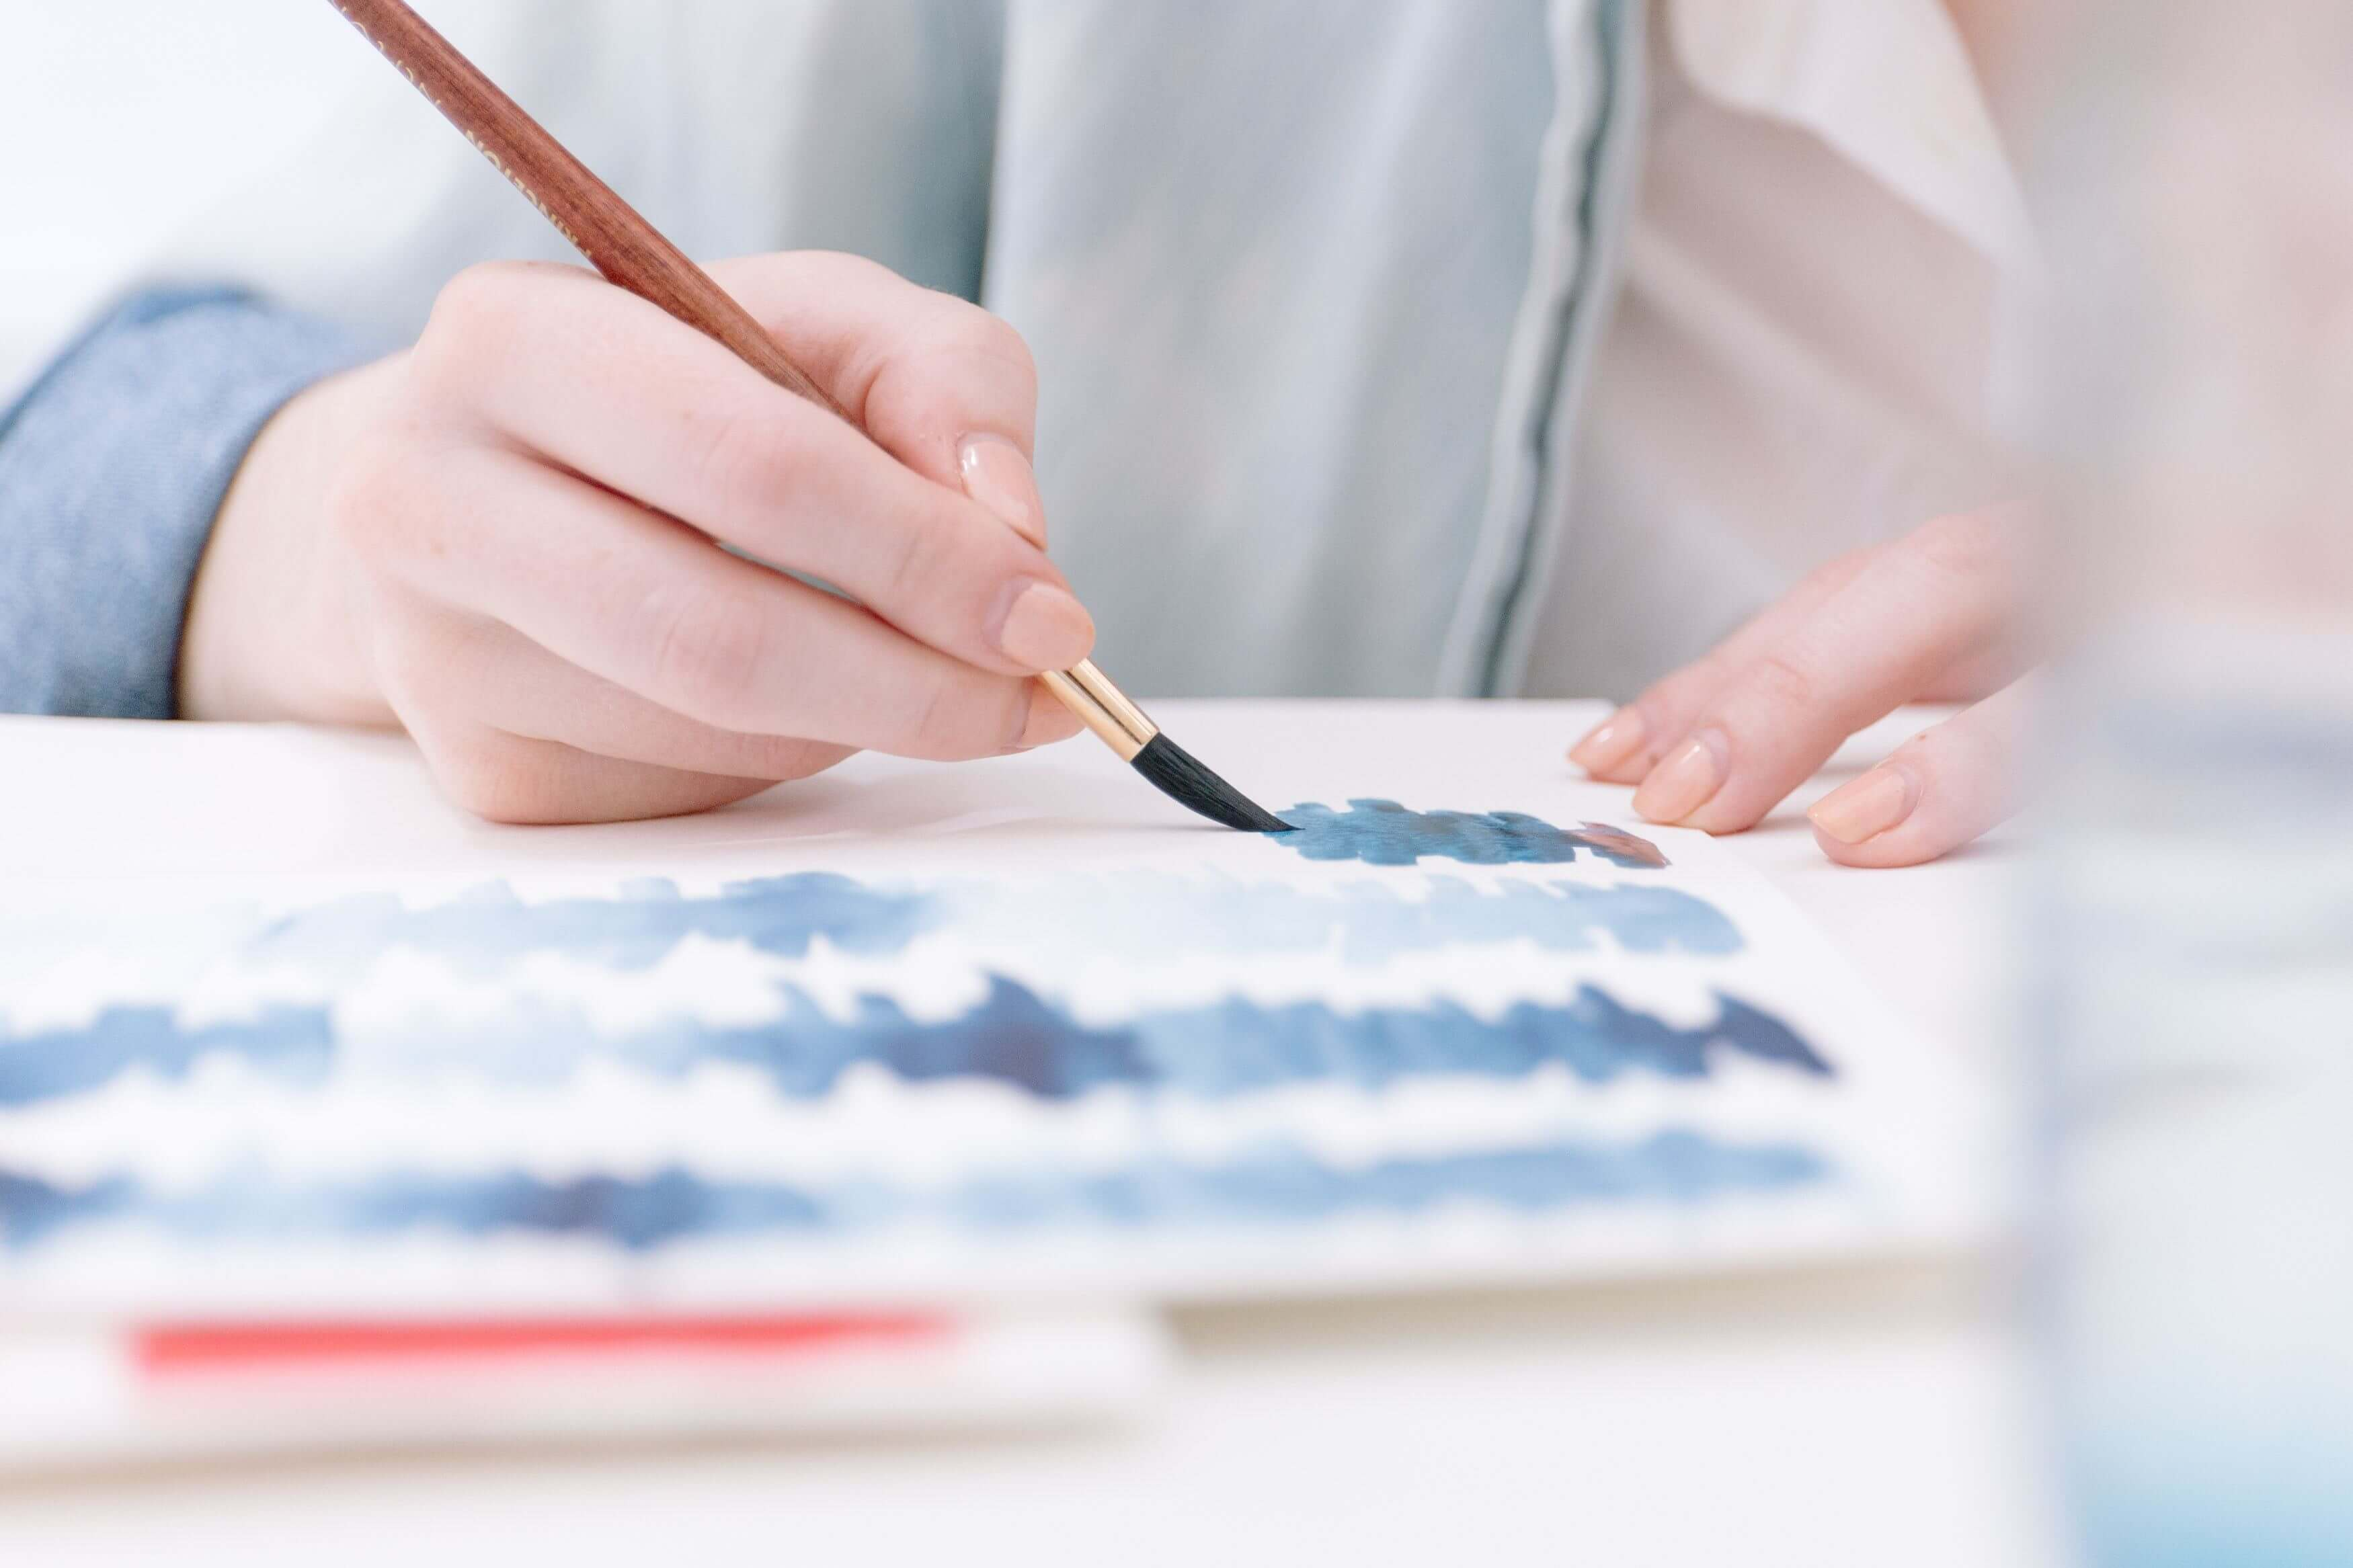 paintbrush 4